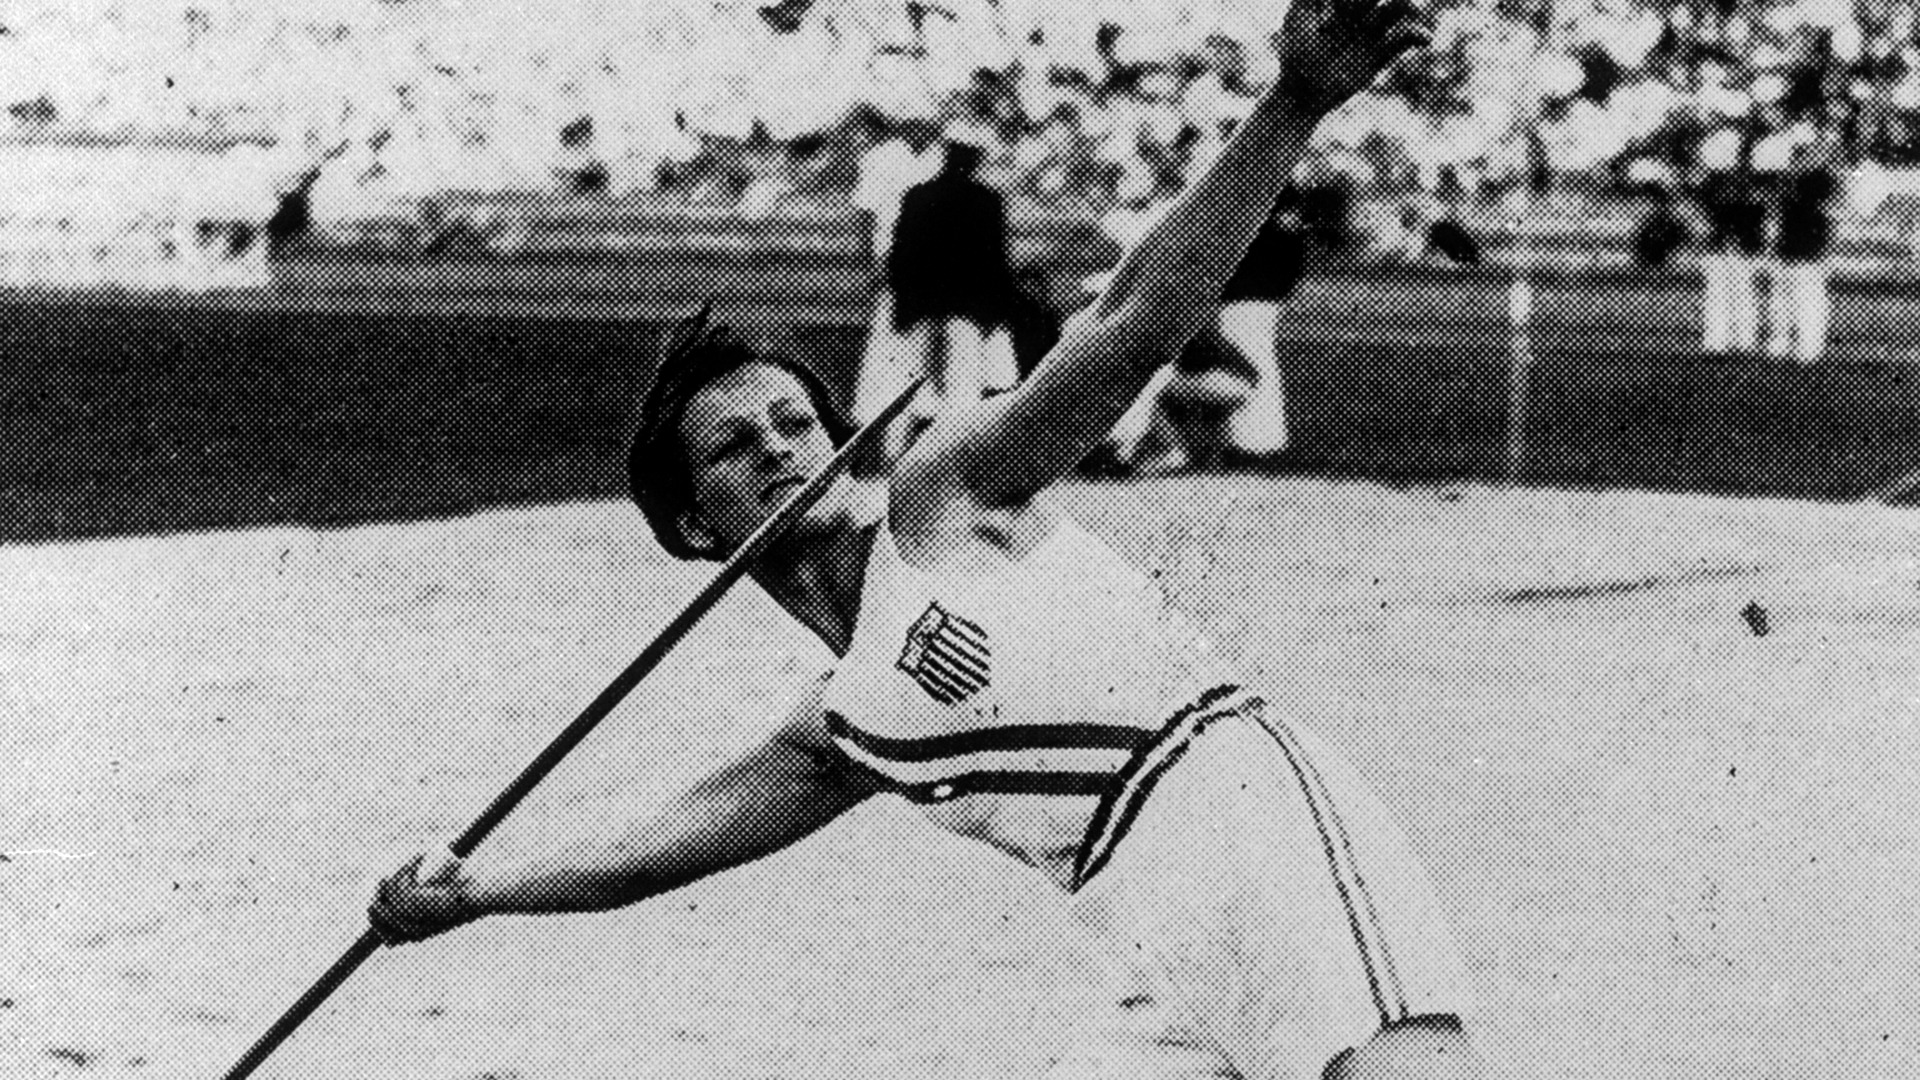 Babe Zaharias, l'olympique